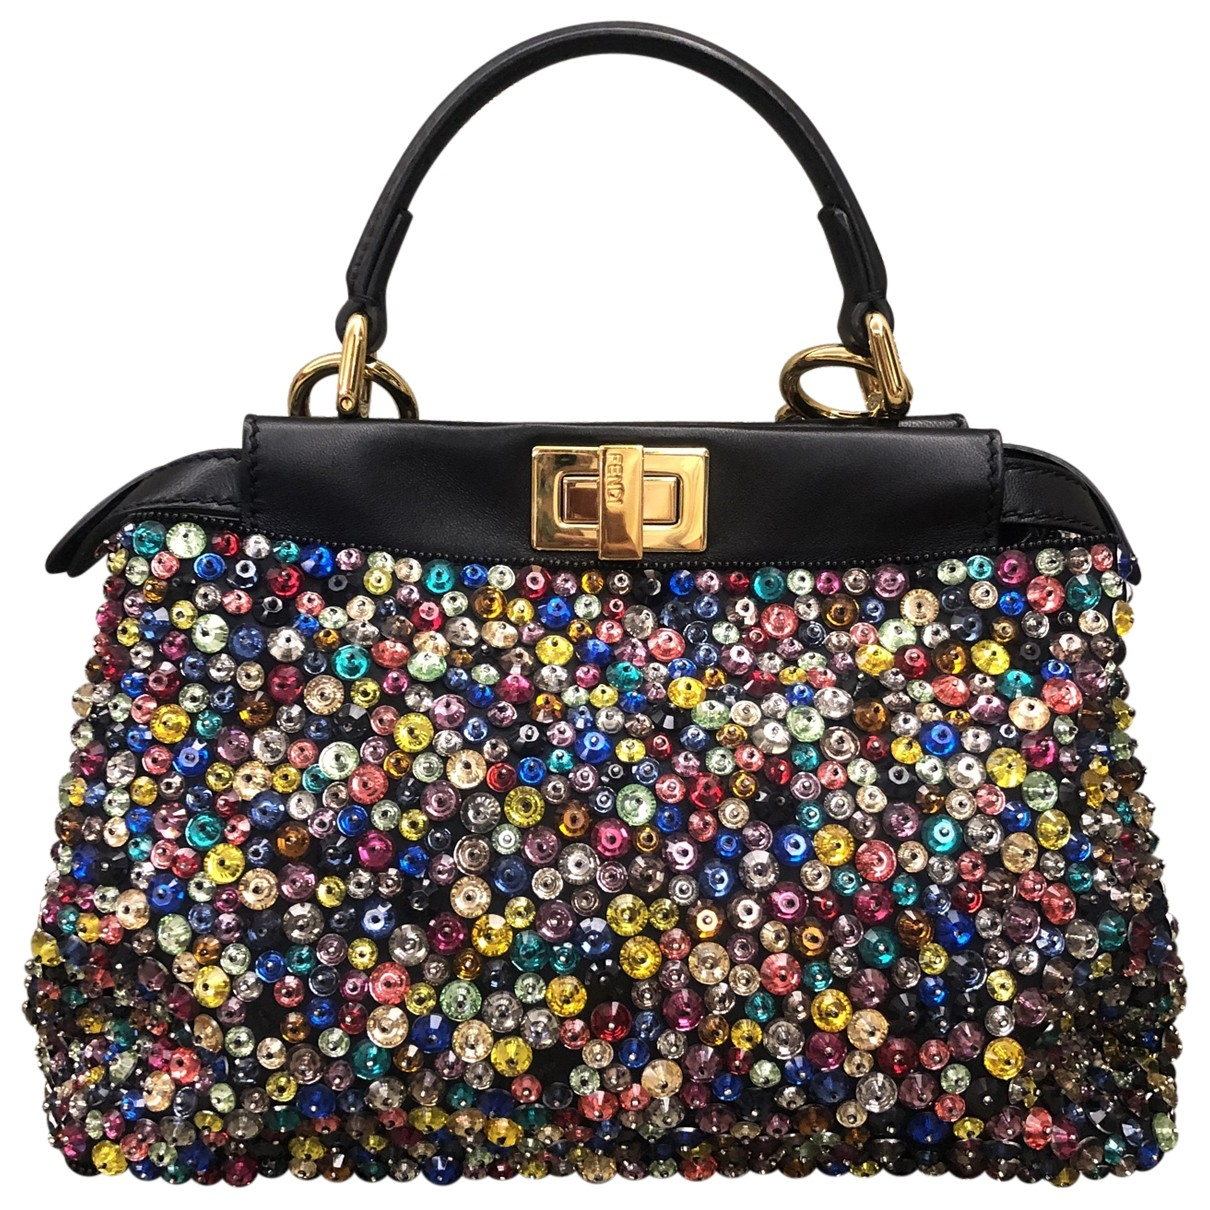 Fendi Peekaboo Handtasche in  Bunt Mit Pailletten